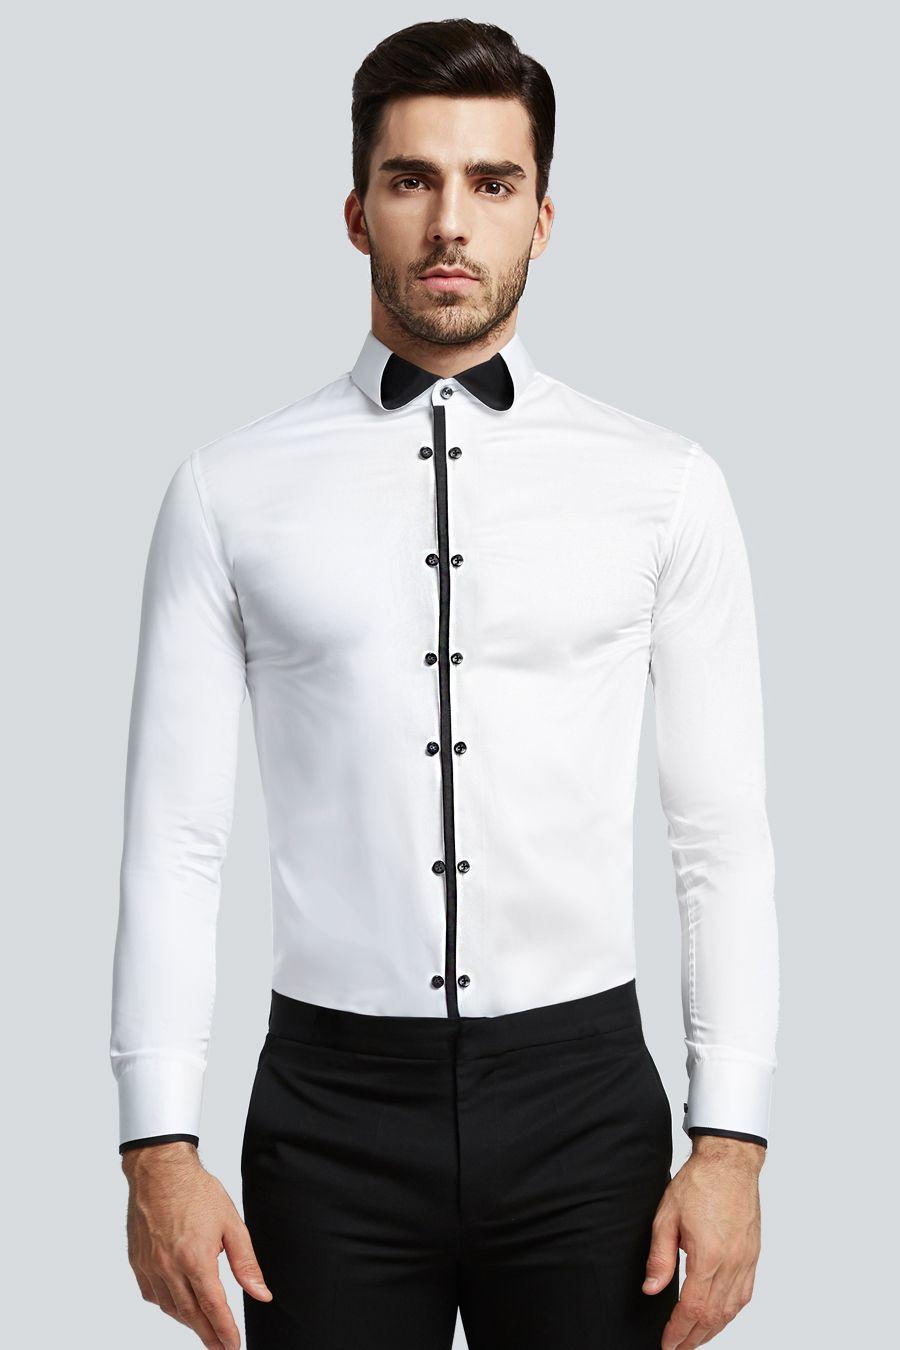 aa034ed0 Designer Shirt by Adamist | showmen | Shirts, Cotton shirts for men ...